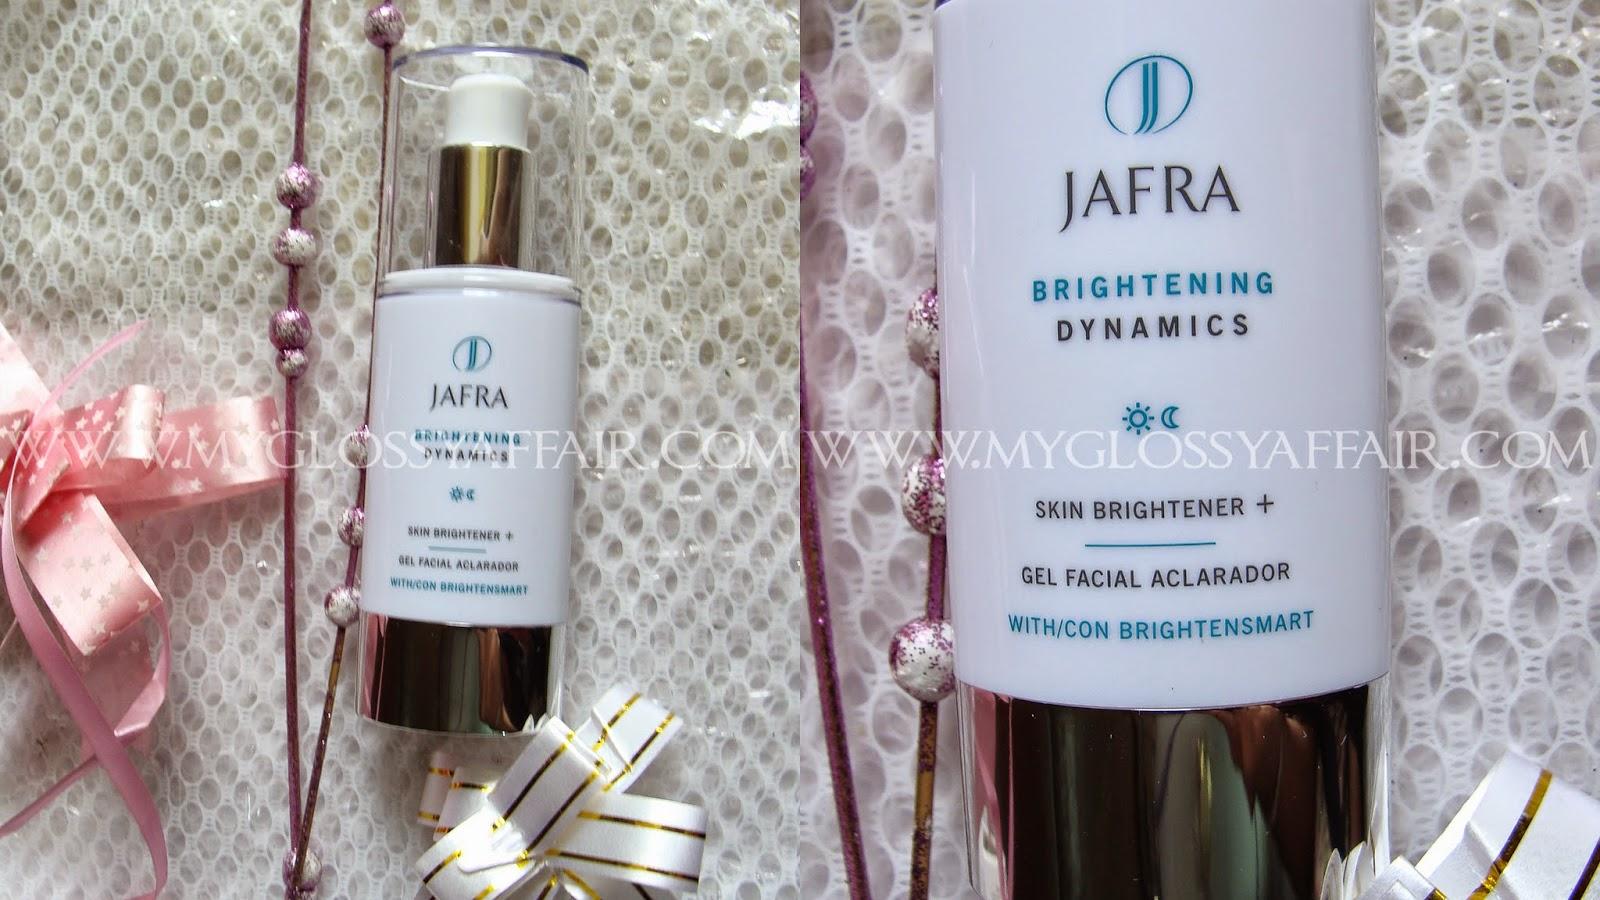 Jafra Skin Brightening Serum